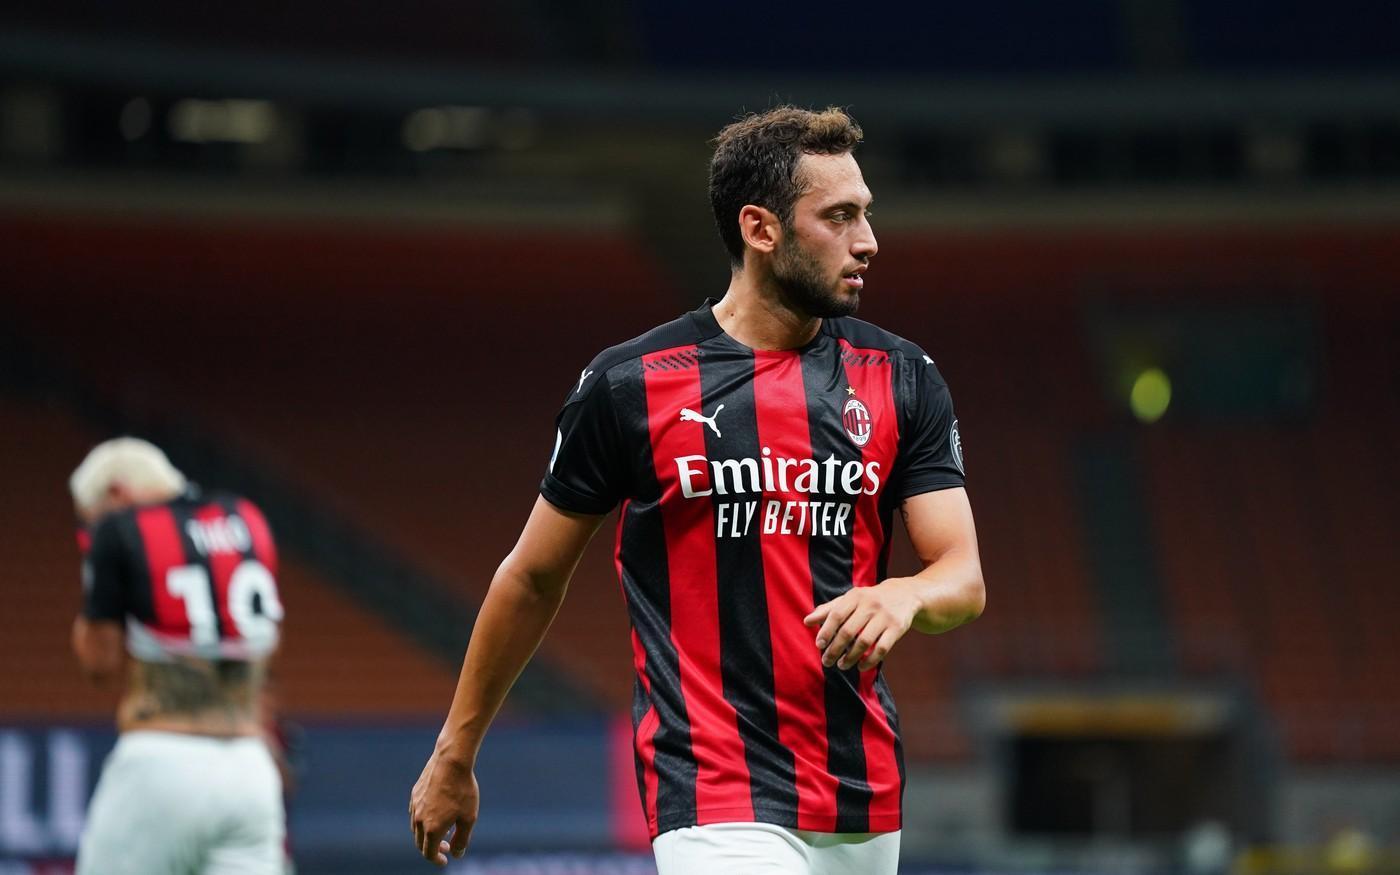 Milan, infortunio per Calhanoglu: a rischio la partita contro la Roma